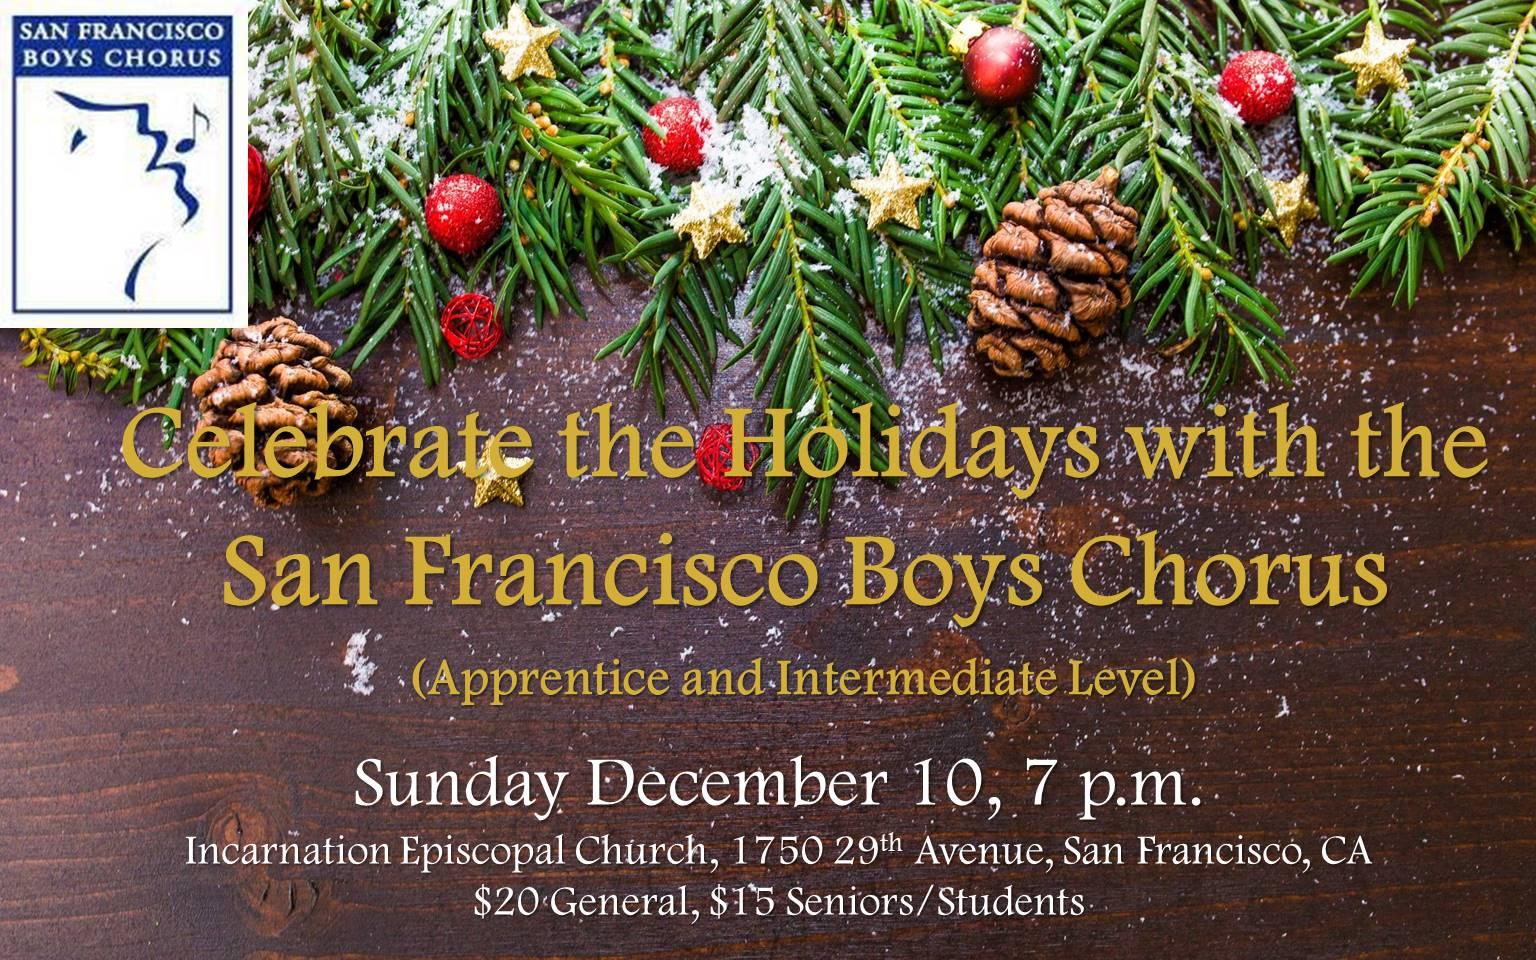 SF Boys Chorus